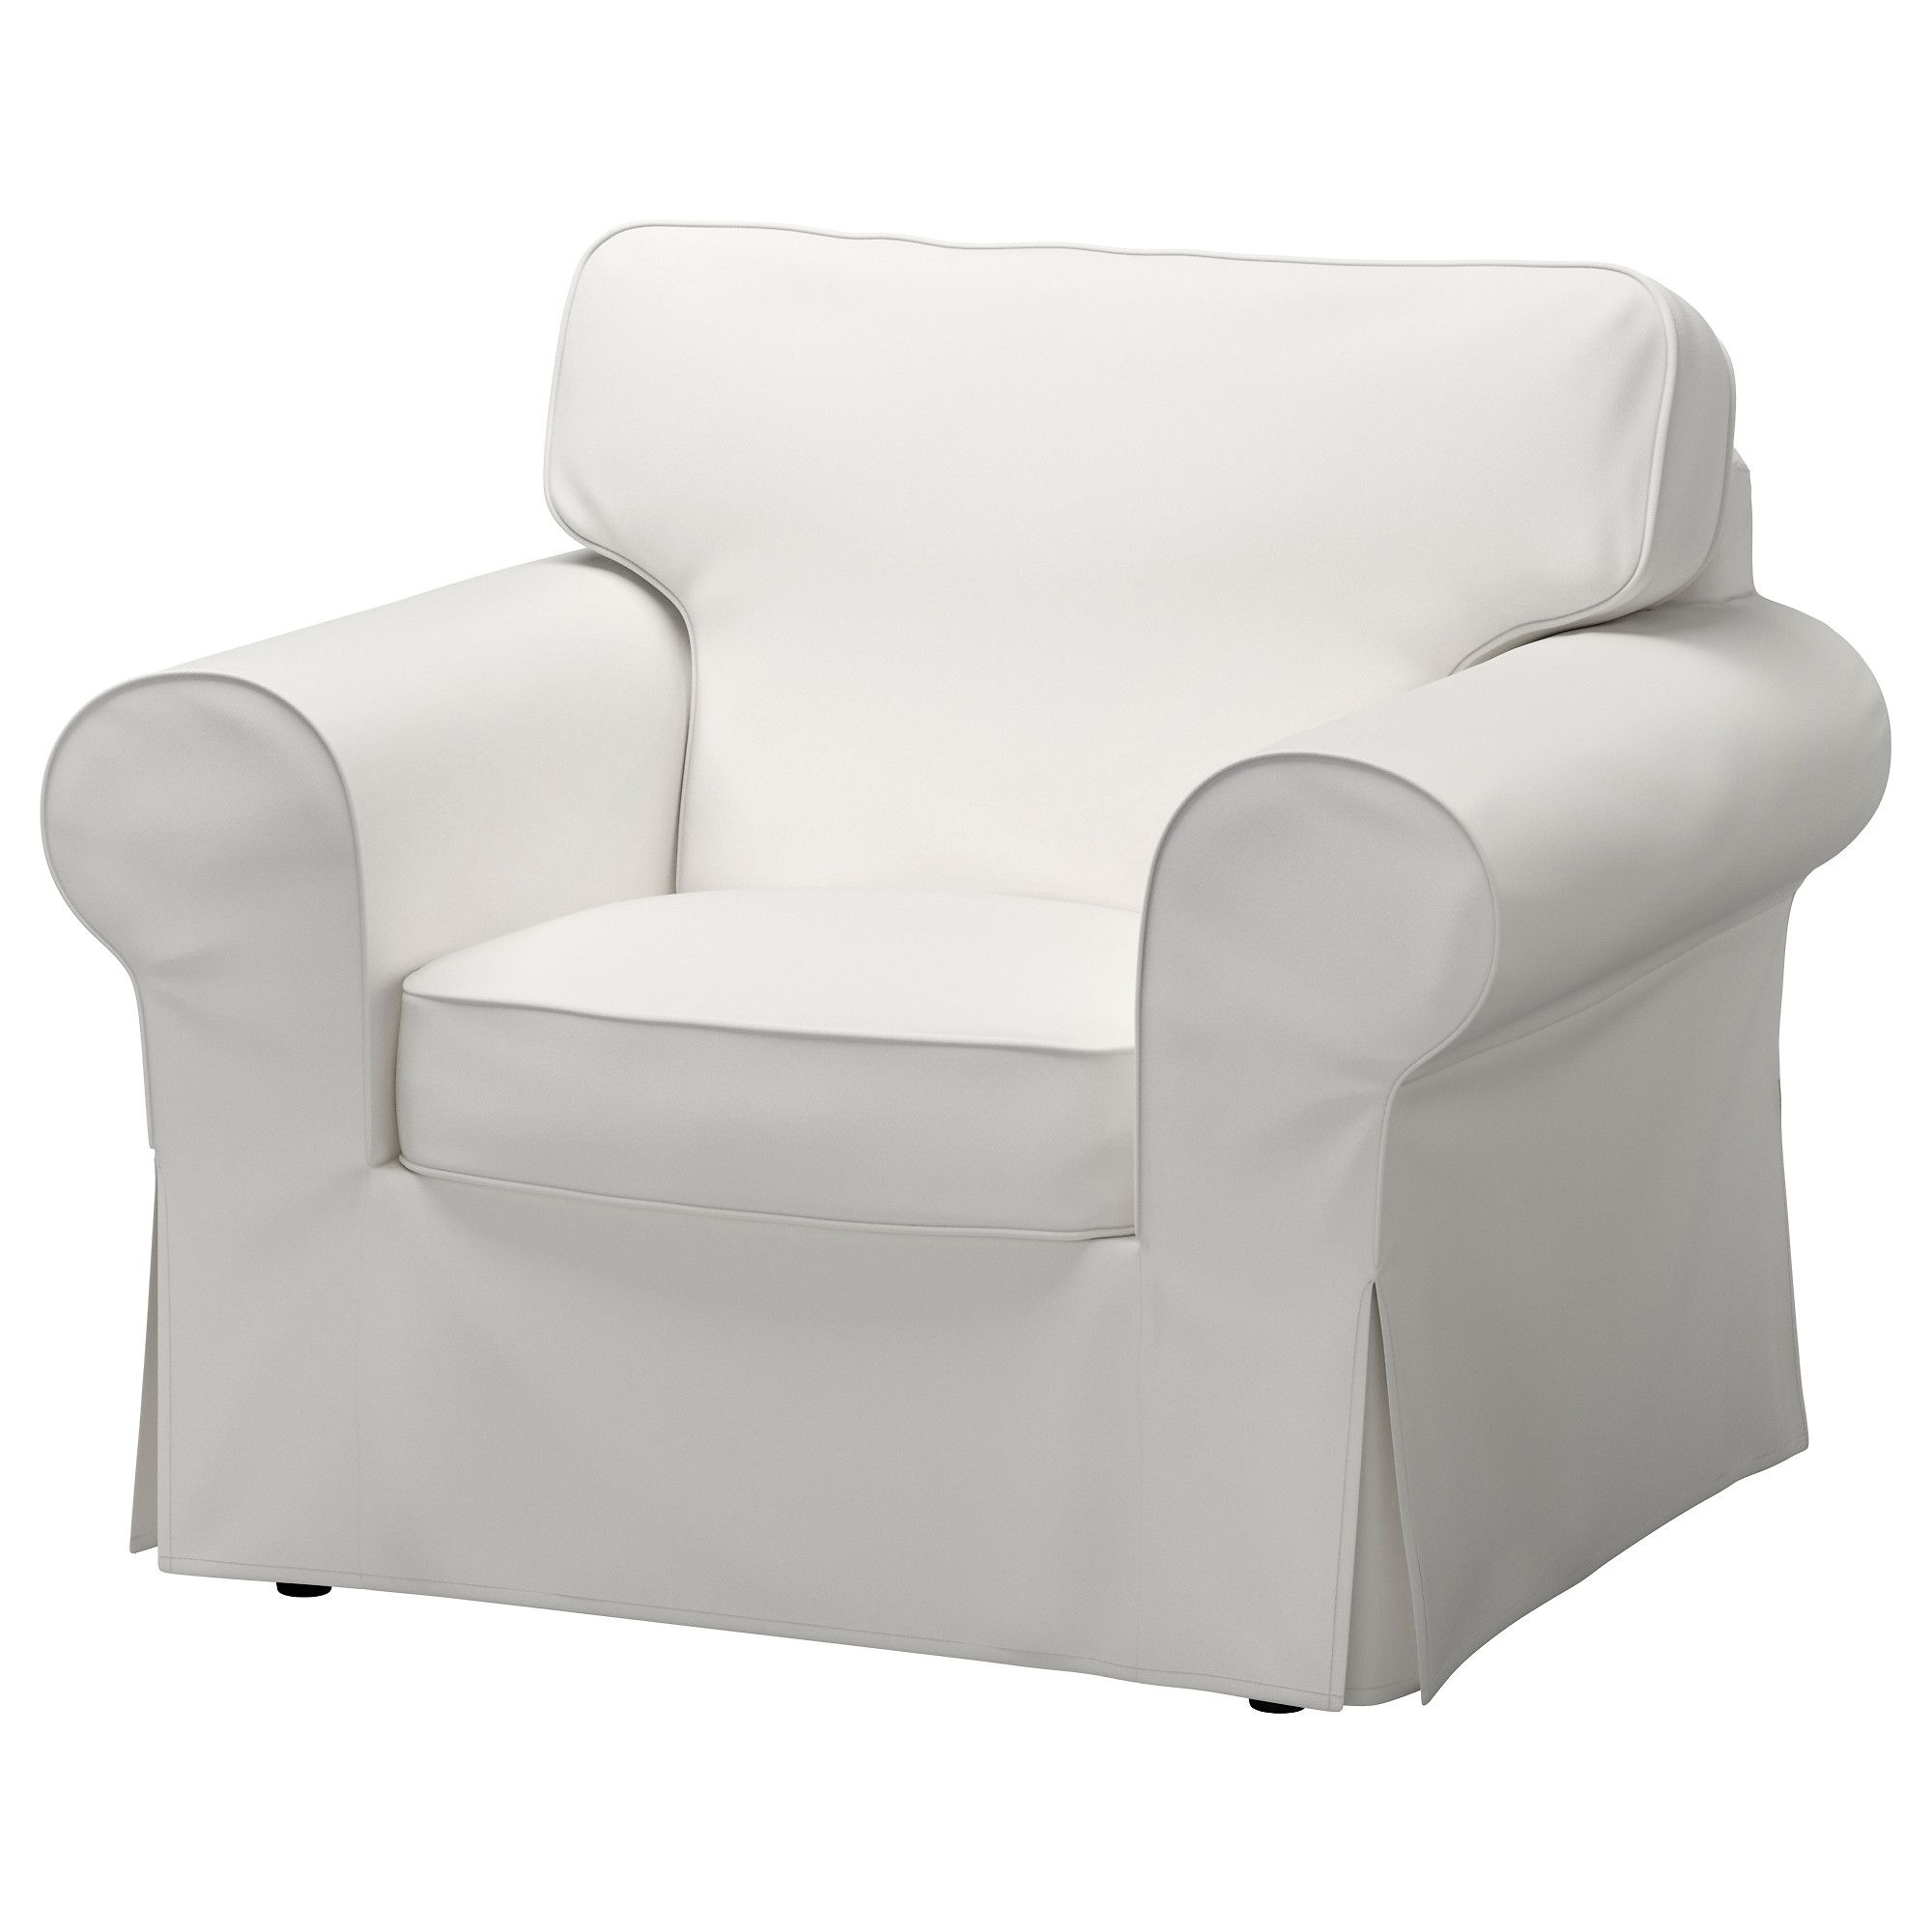 Ektorp Armchair Vittaryd White Slipcovers For Chairs